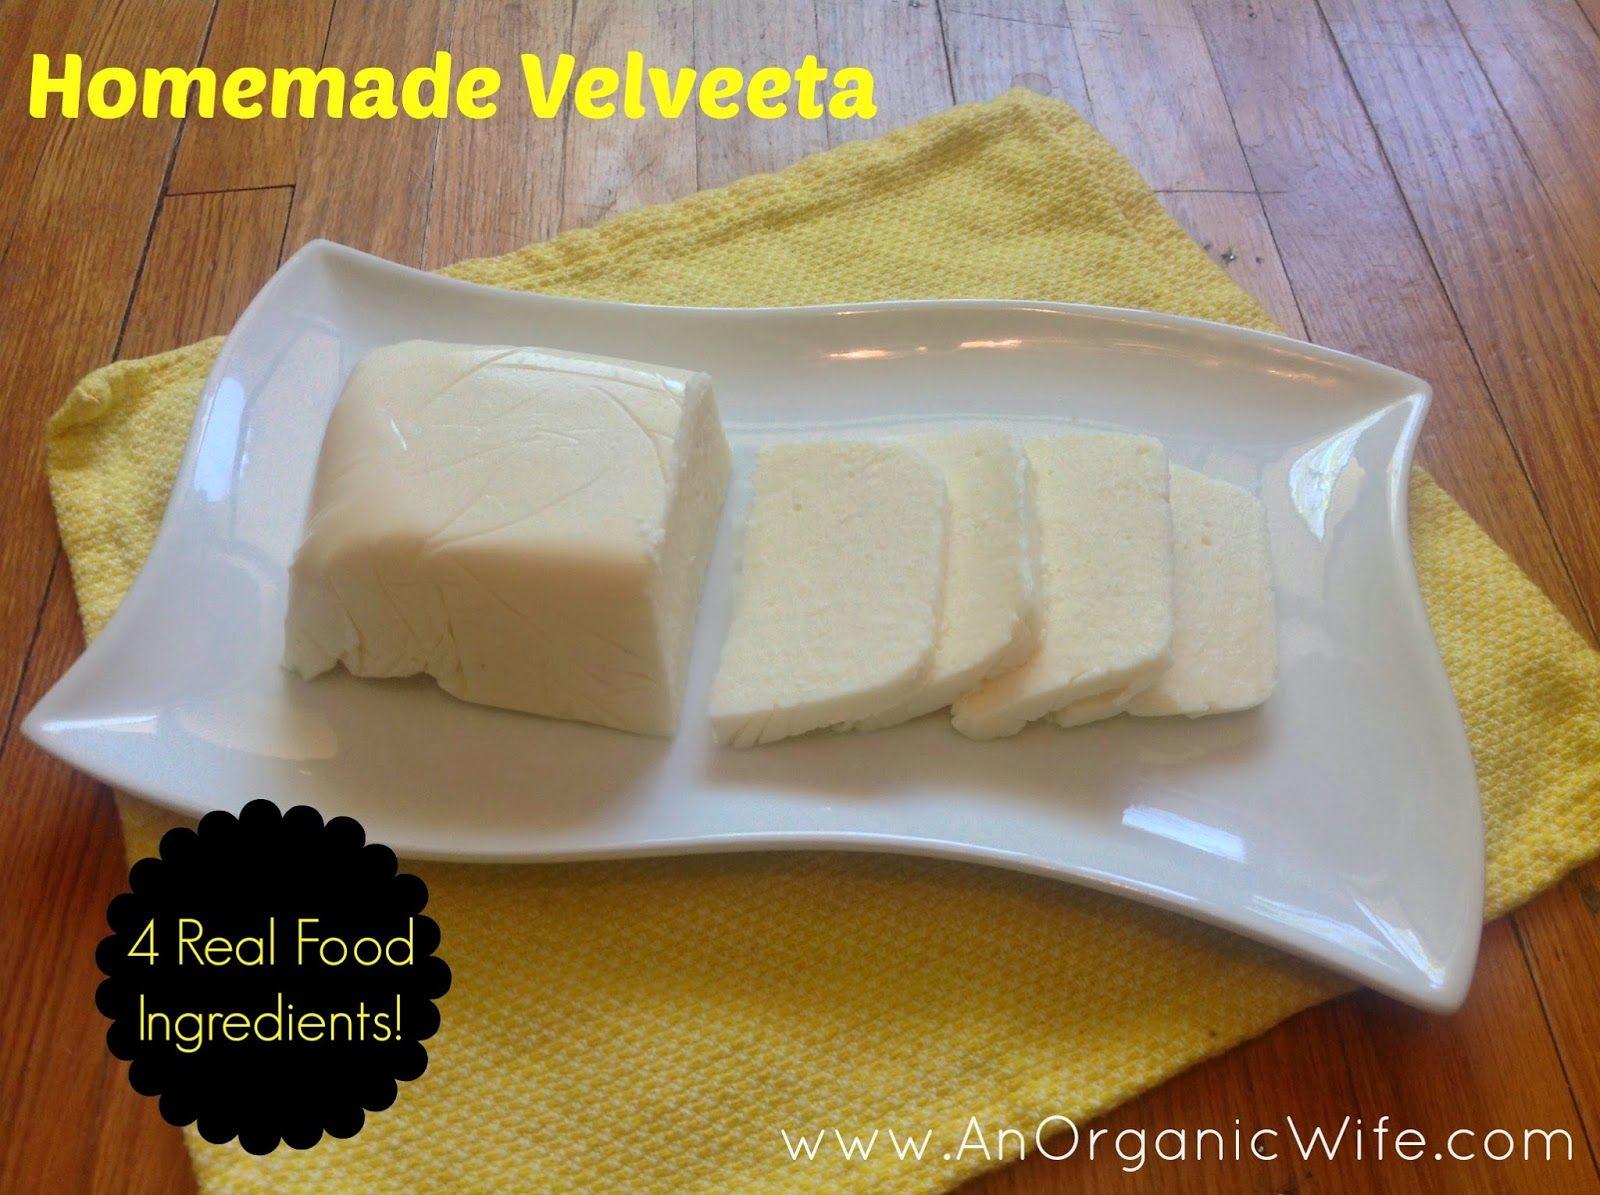 An organic wife recipe homemade velveeta all natural ingredients an organic wife recipe homemade velveeta all natural ingredients forumfinder Image collections